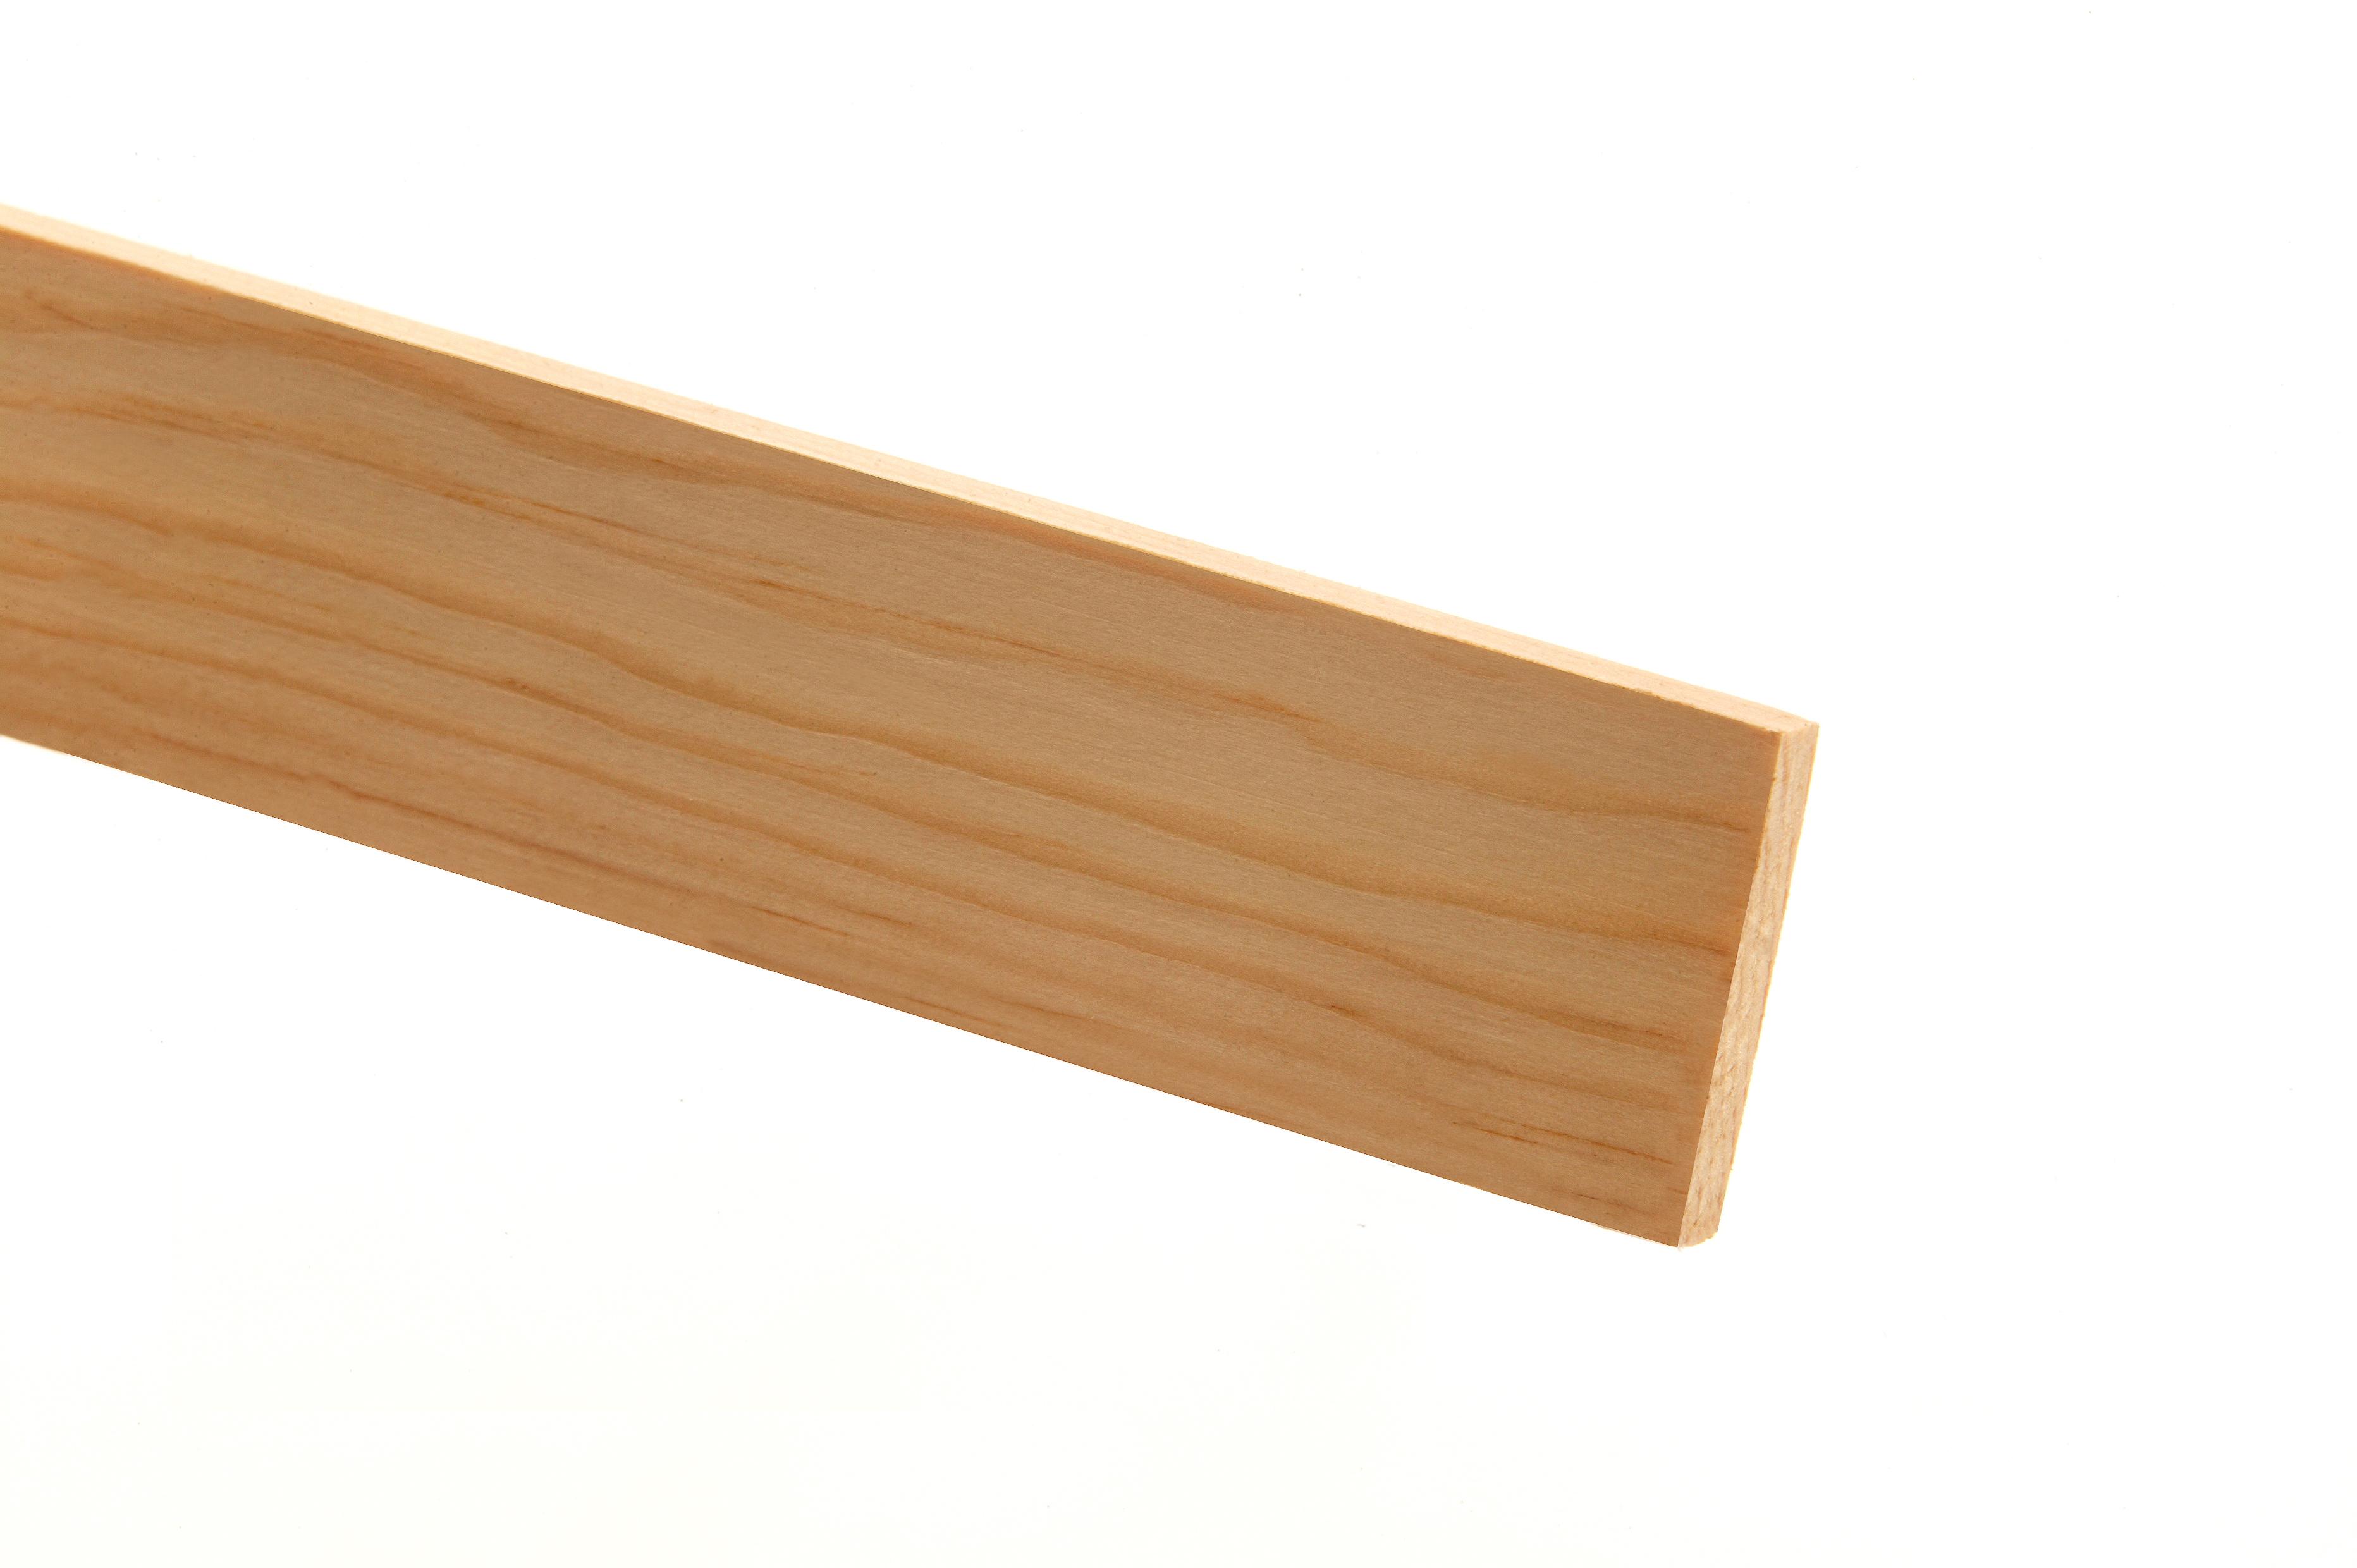 5 Pine PSE Stripwood 21 x 145 x 2400mm